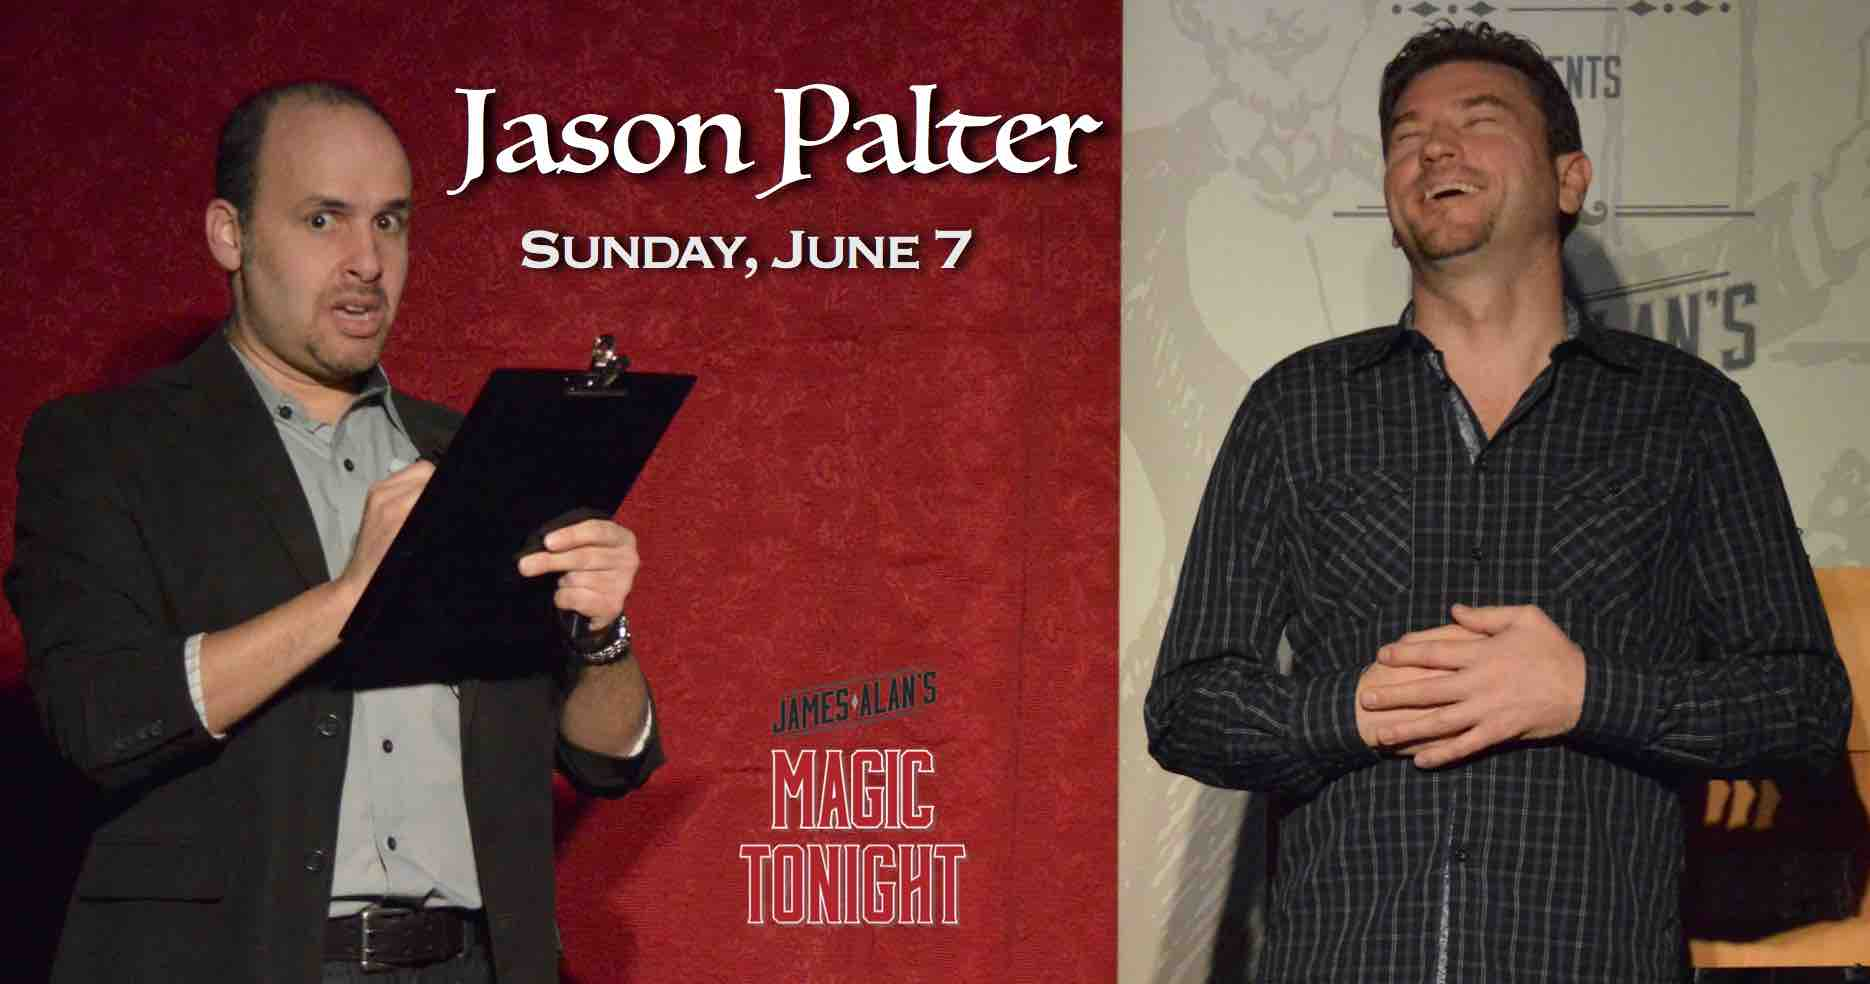 June 7 Jason Palter